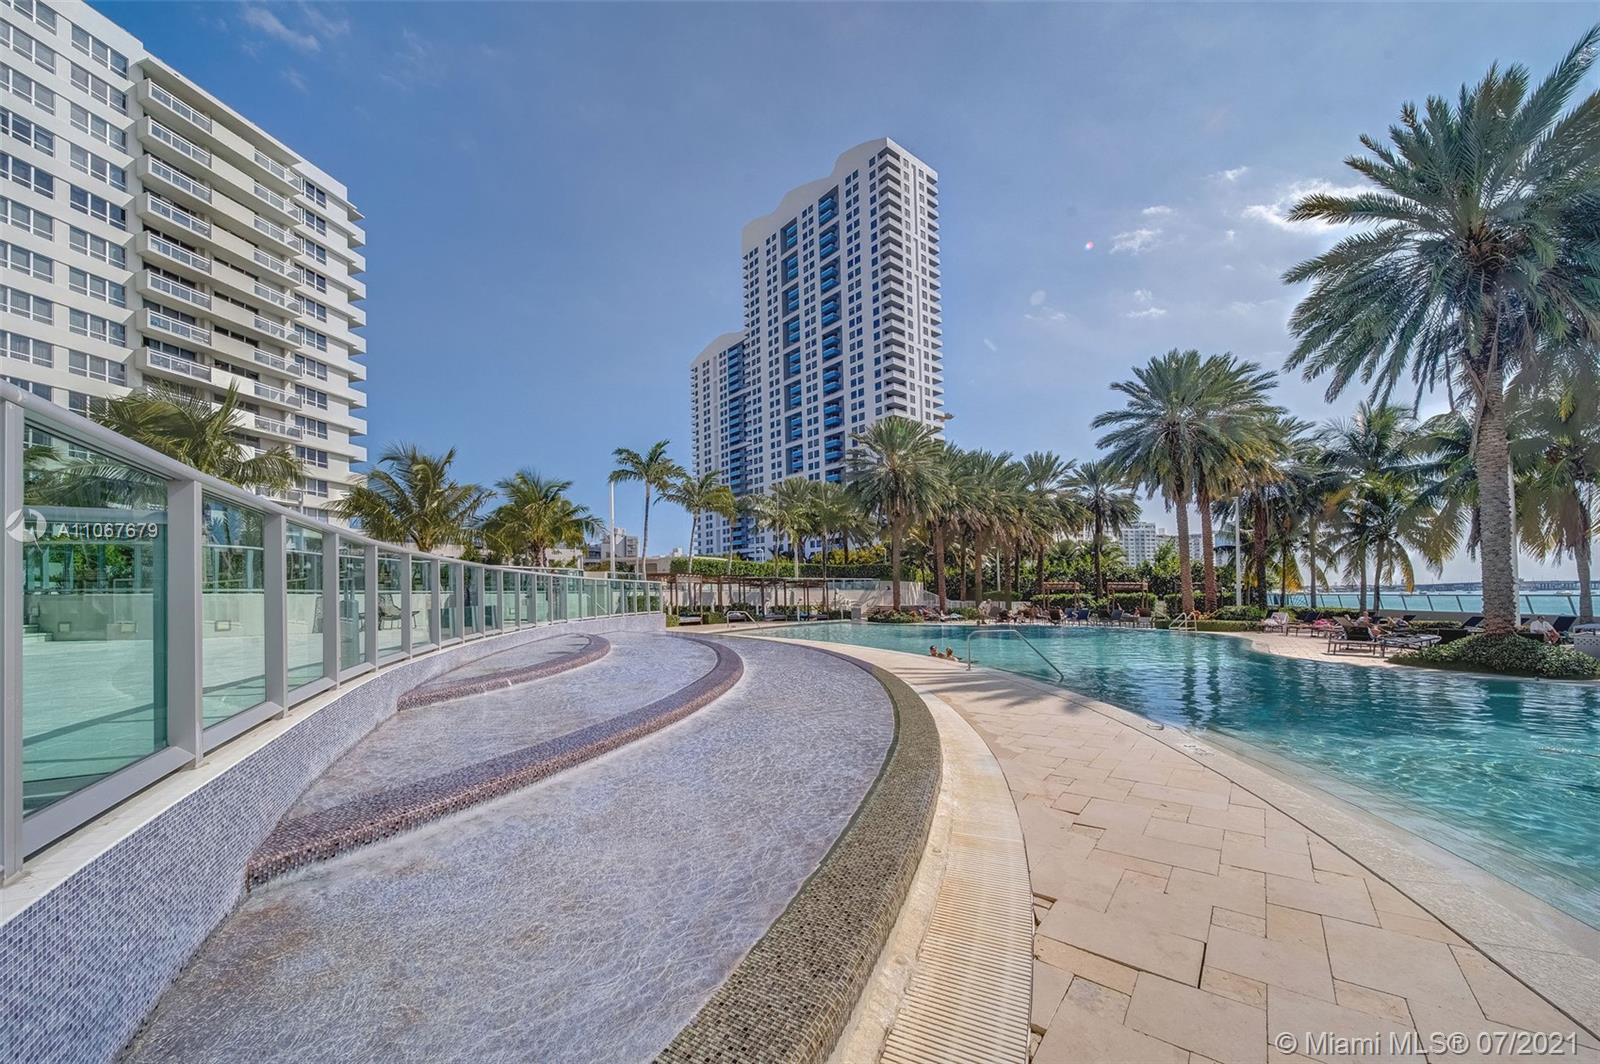 Flamingo South Beach #M-1022 - 65 - photo